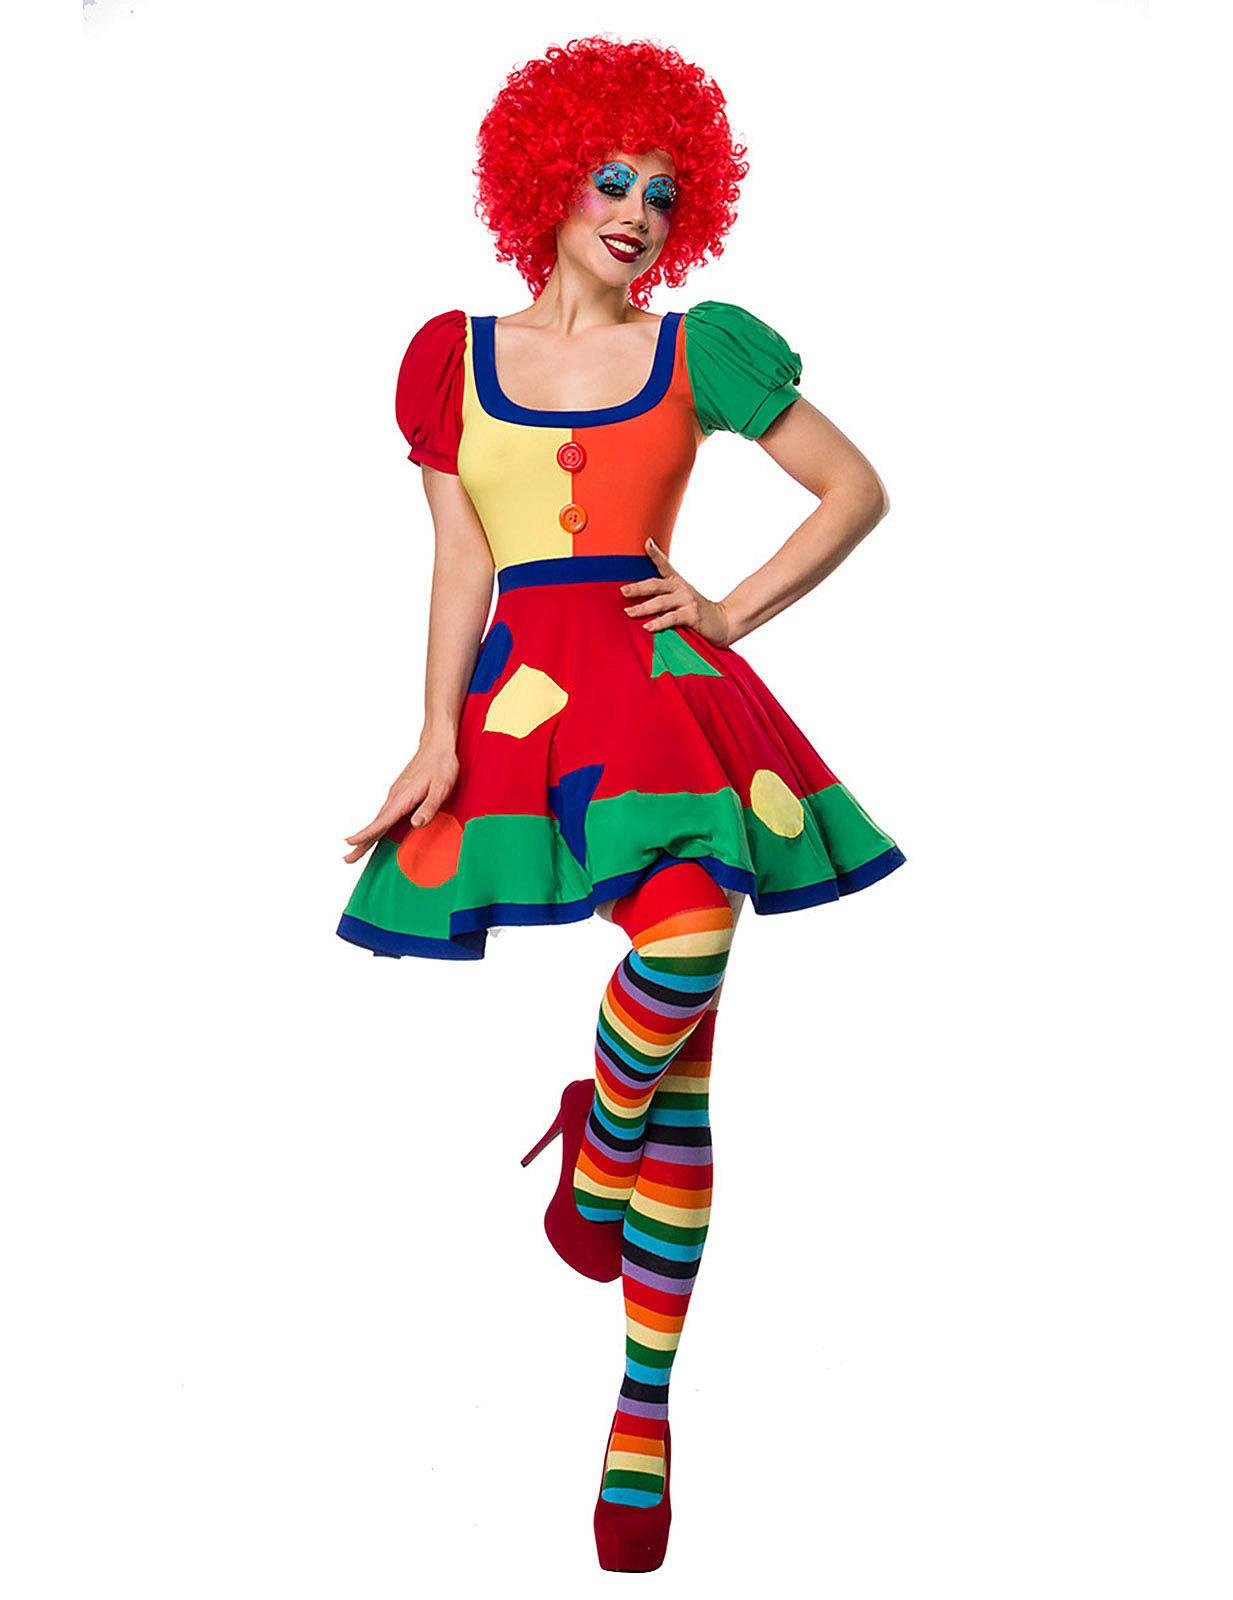 Carnavalskleding Dames Clown.Circus Clown Kostuum Voor Dames Volwassenen Kostuums En Goedkope